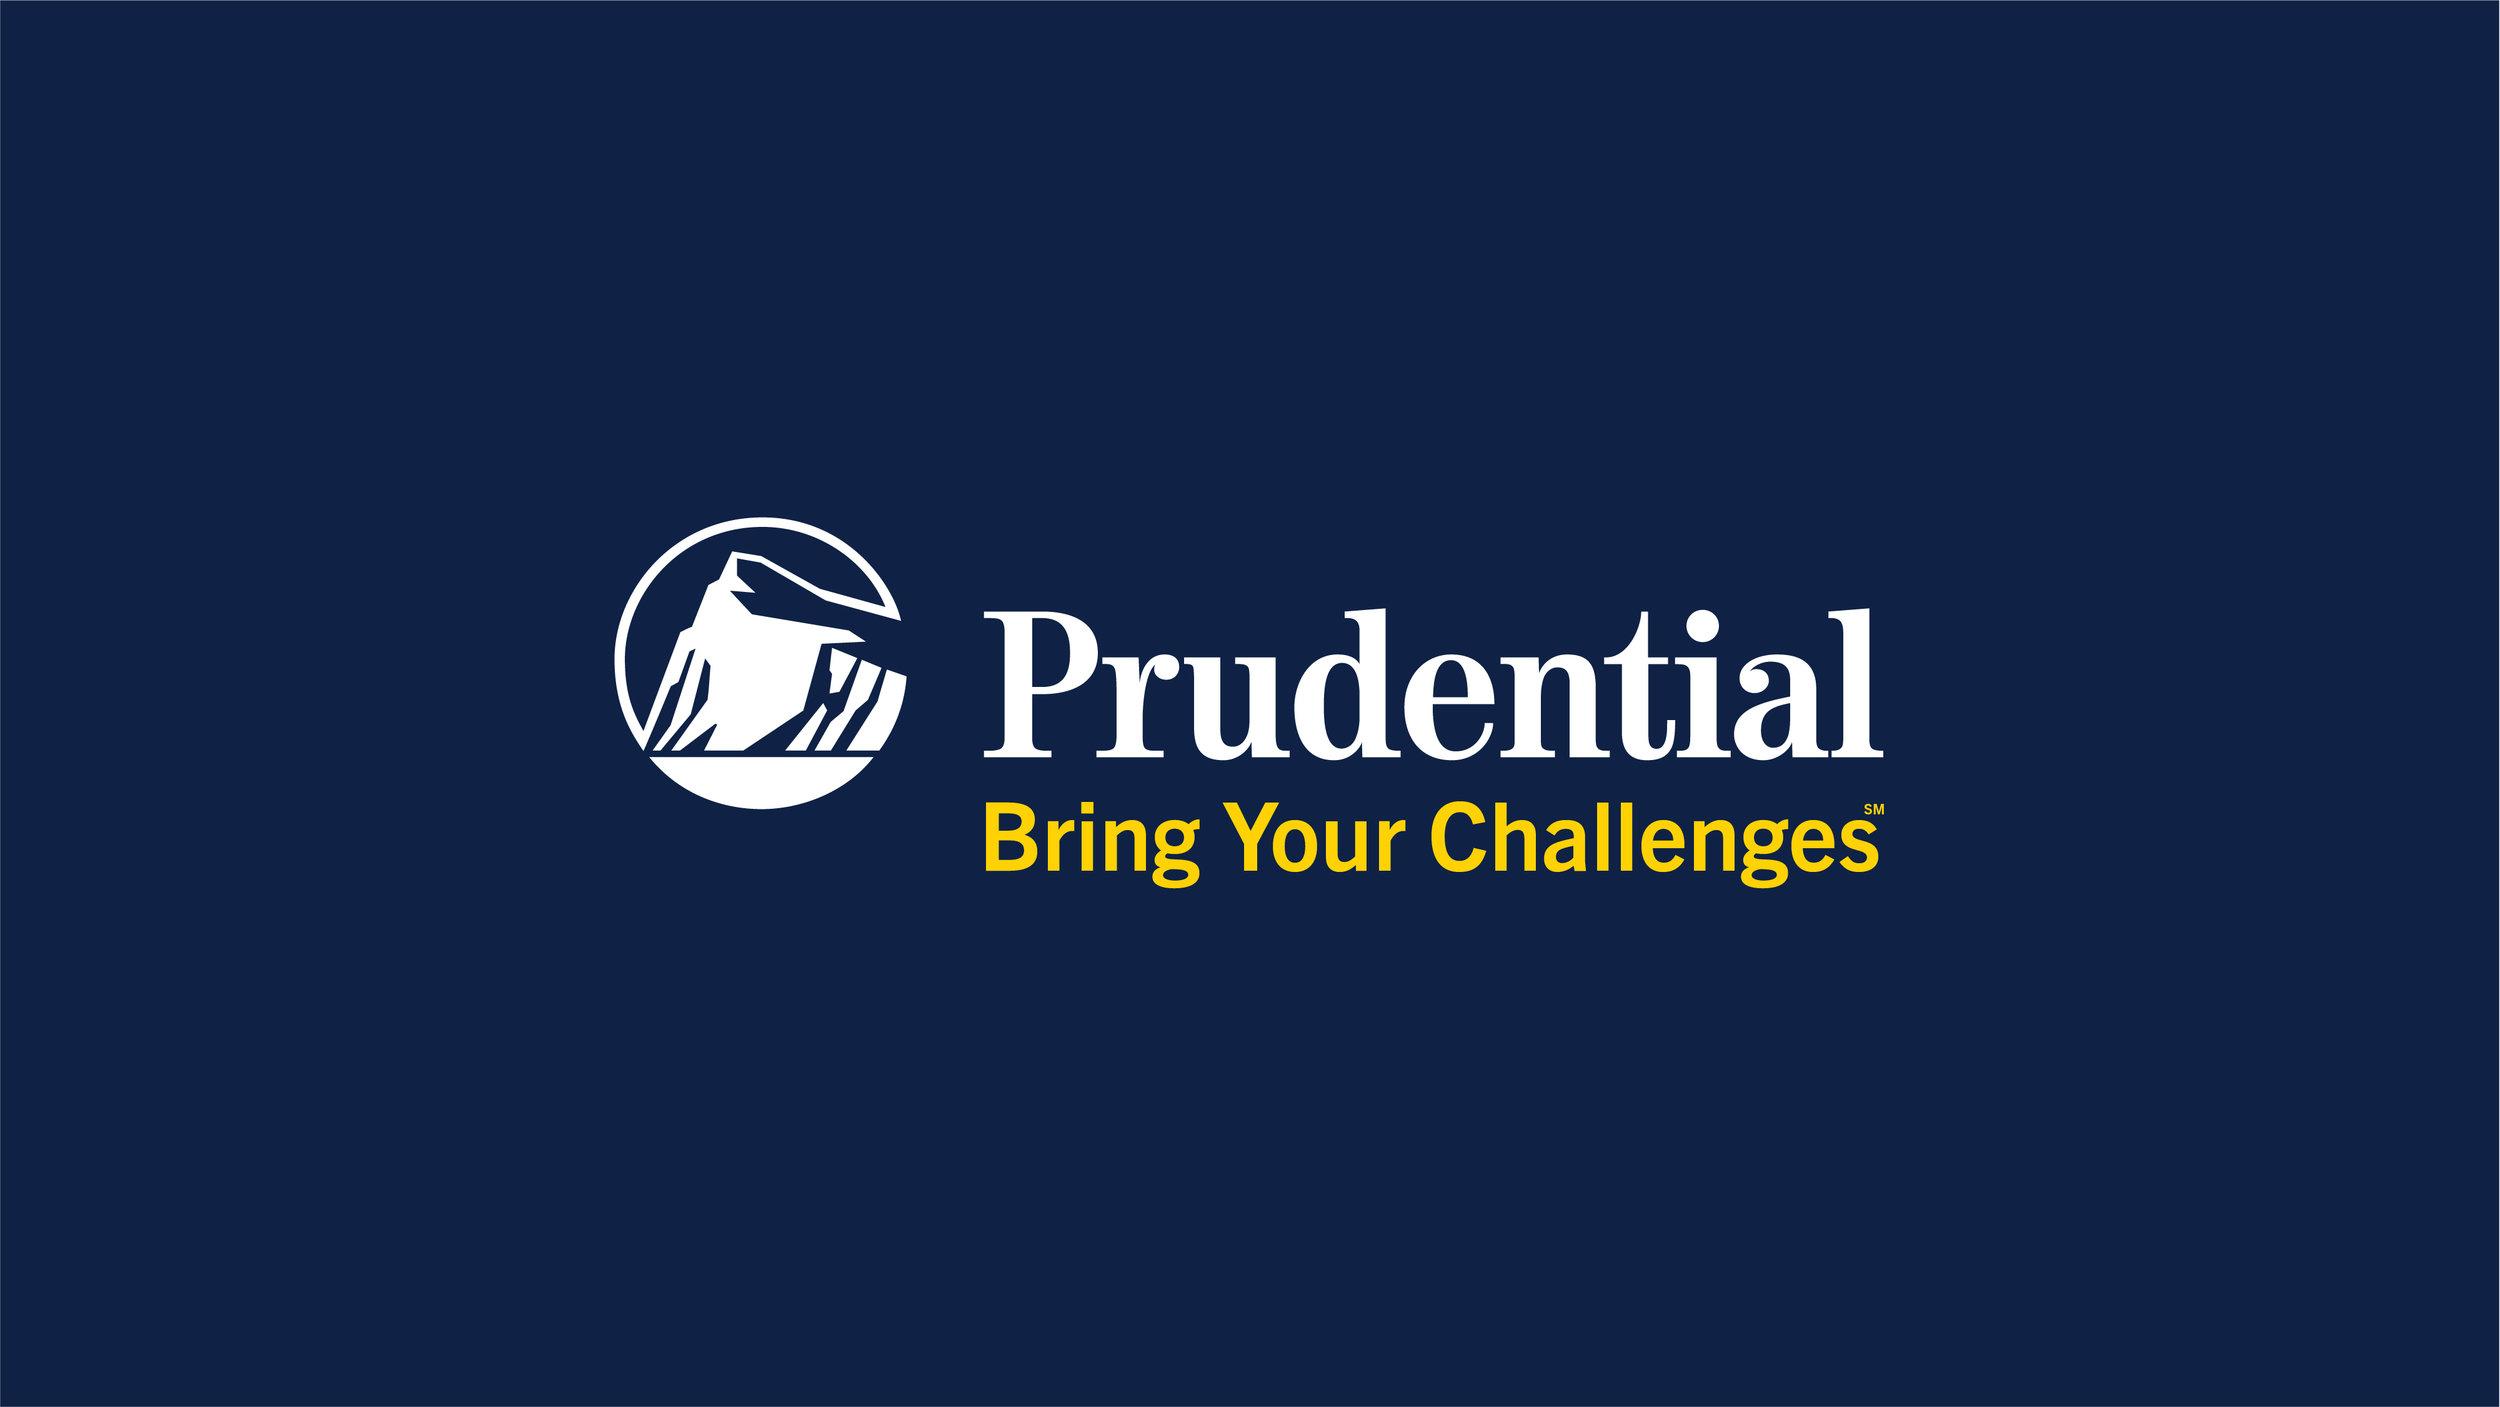 PrudentialRebrand-01.jpg